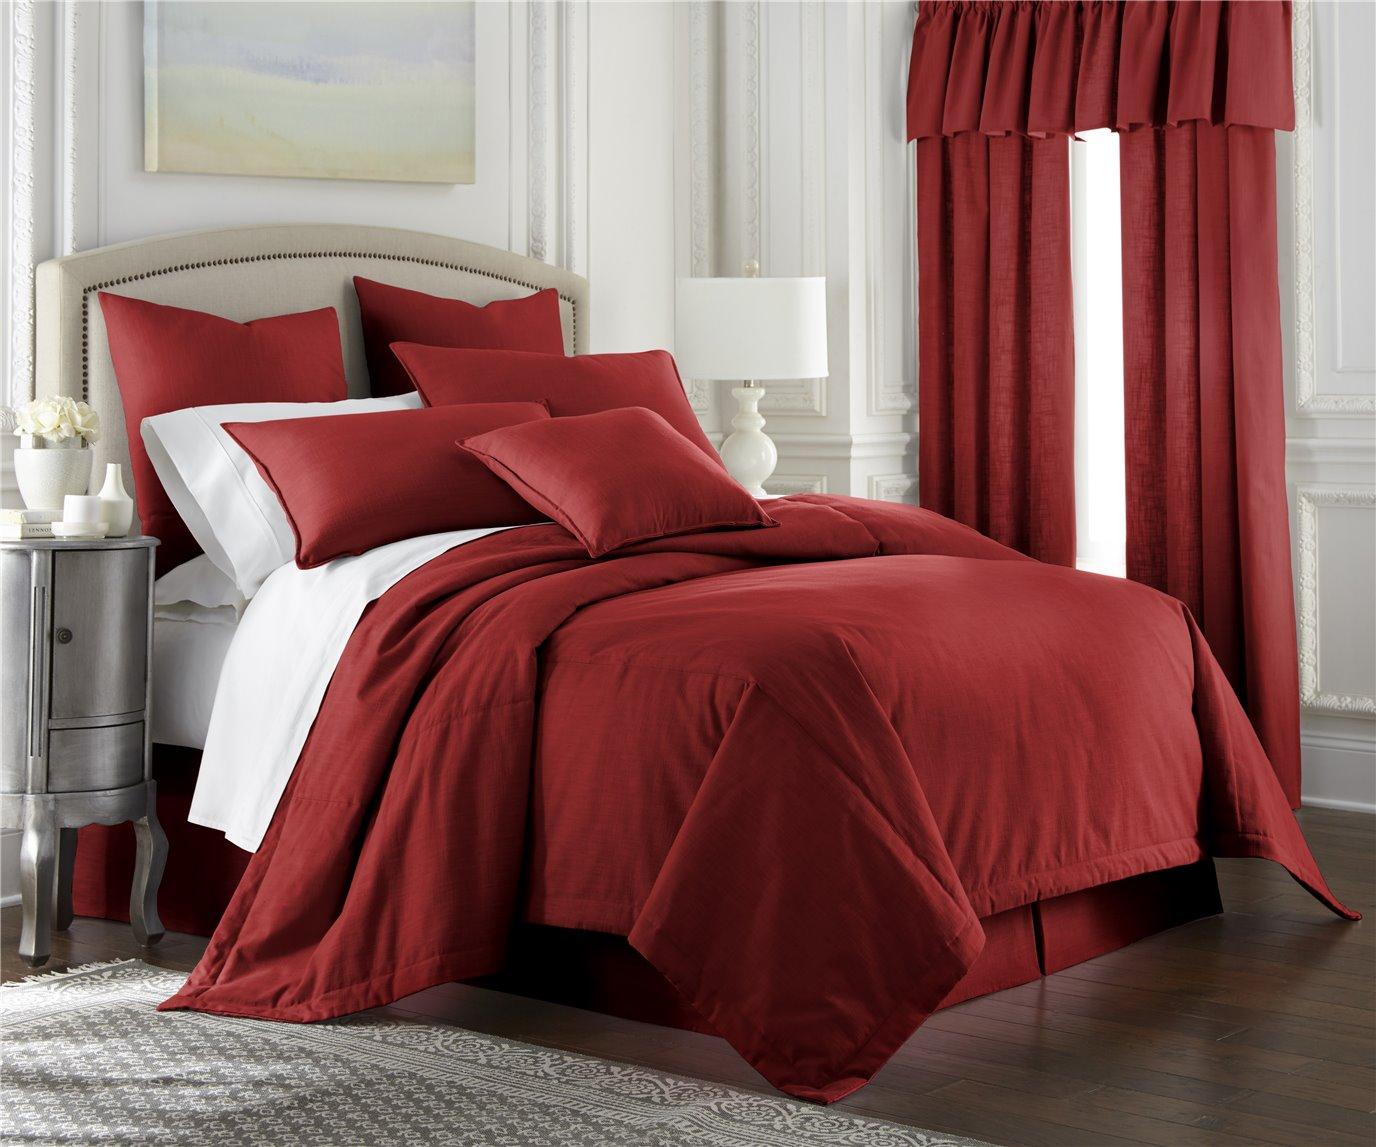 Cambric Red Duvet Cover Super Queen